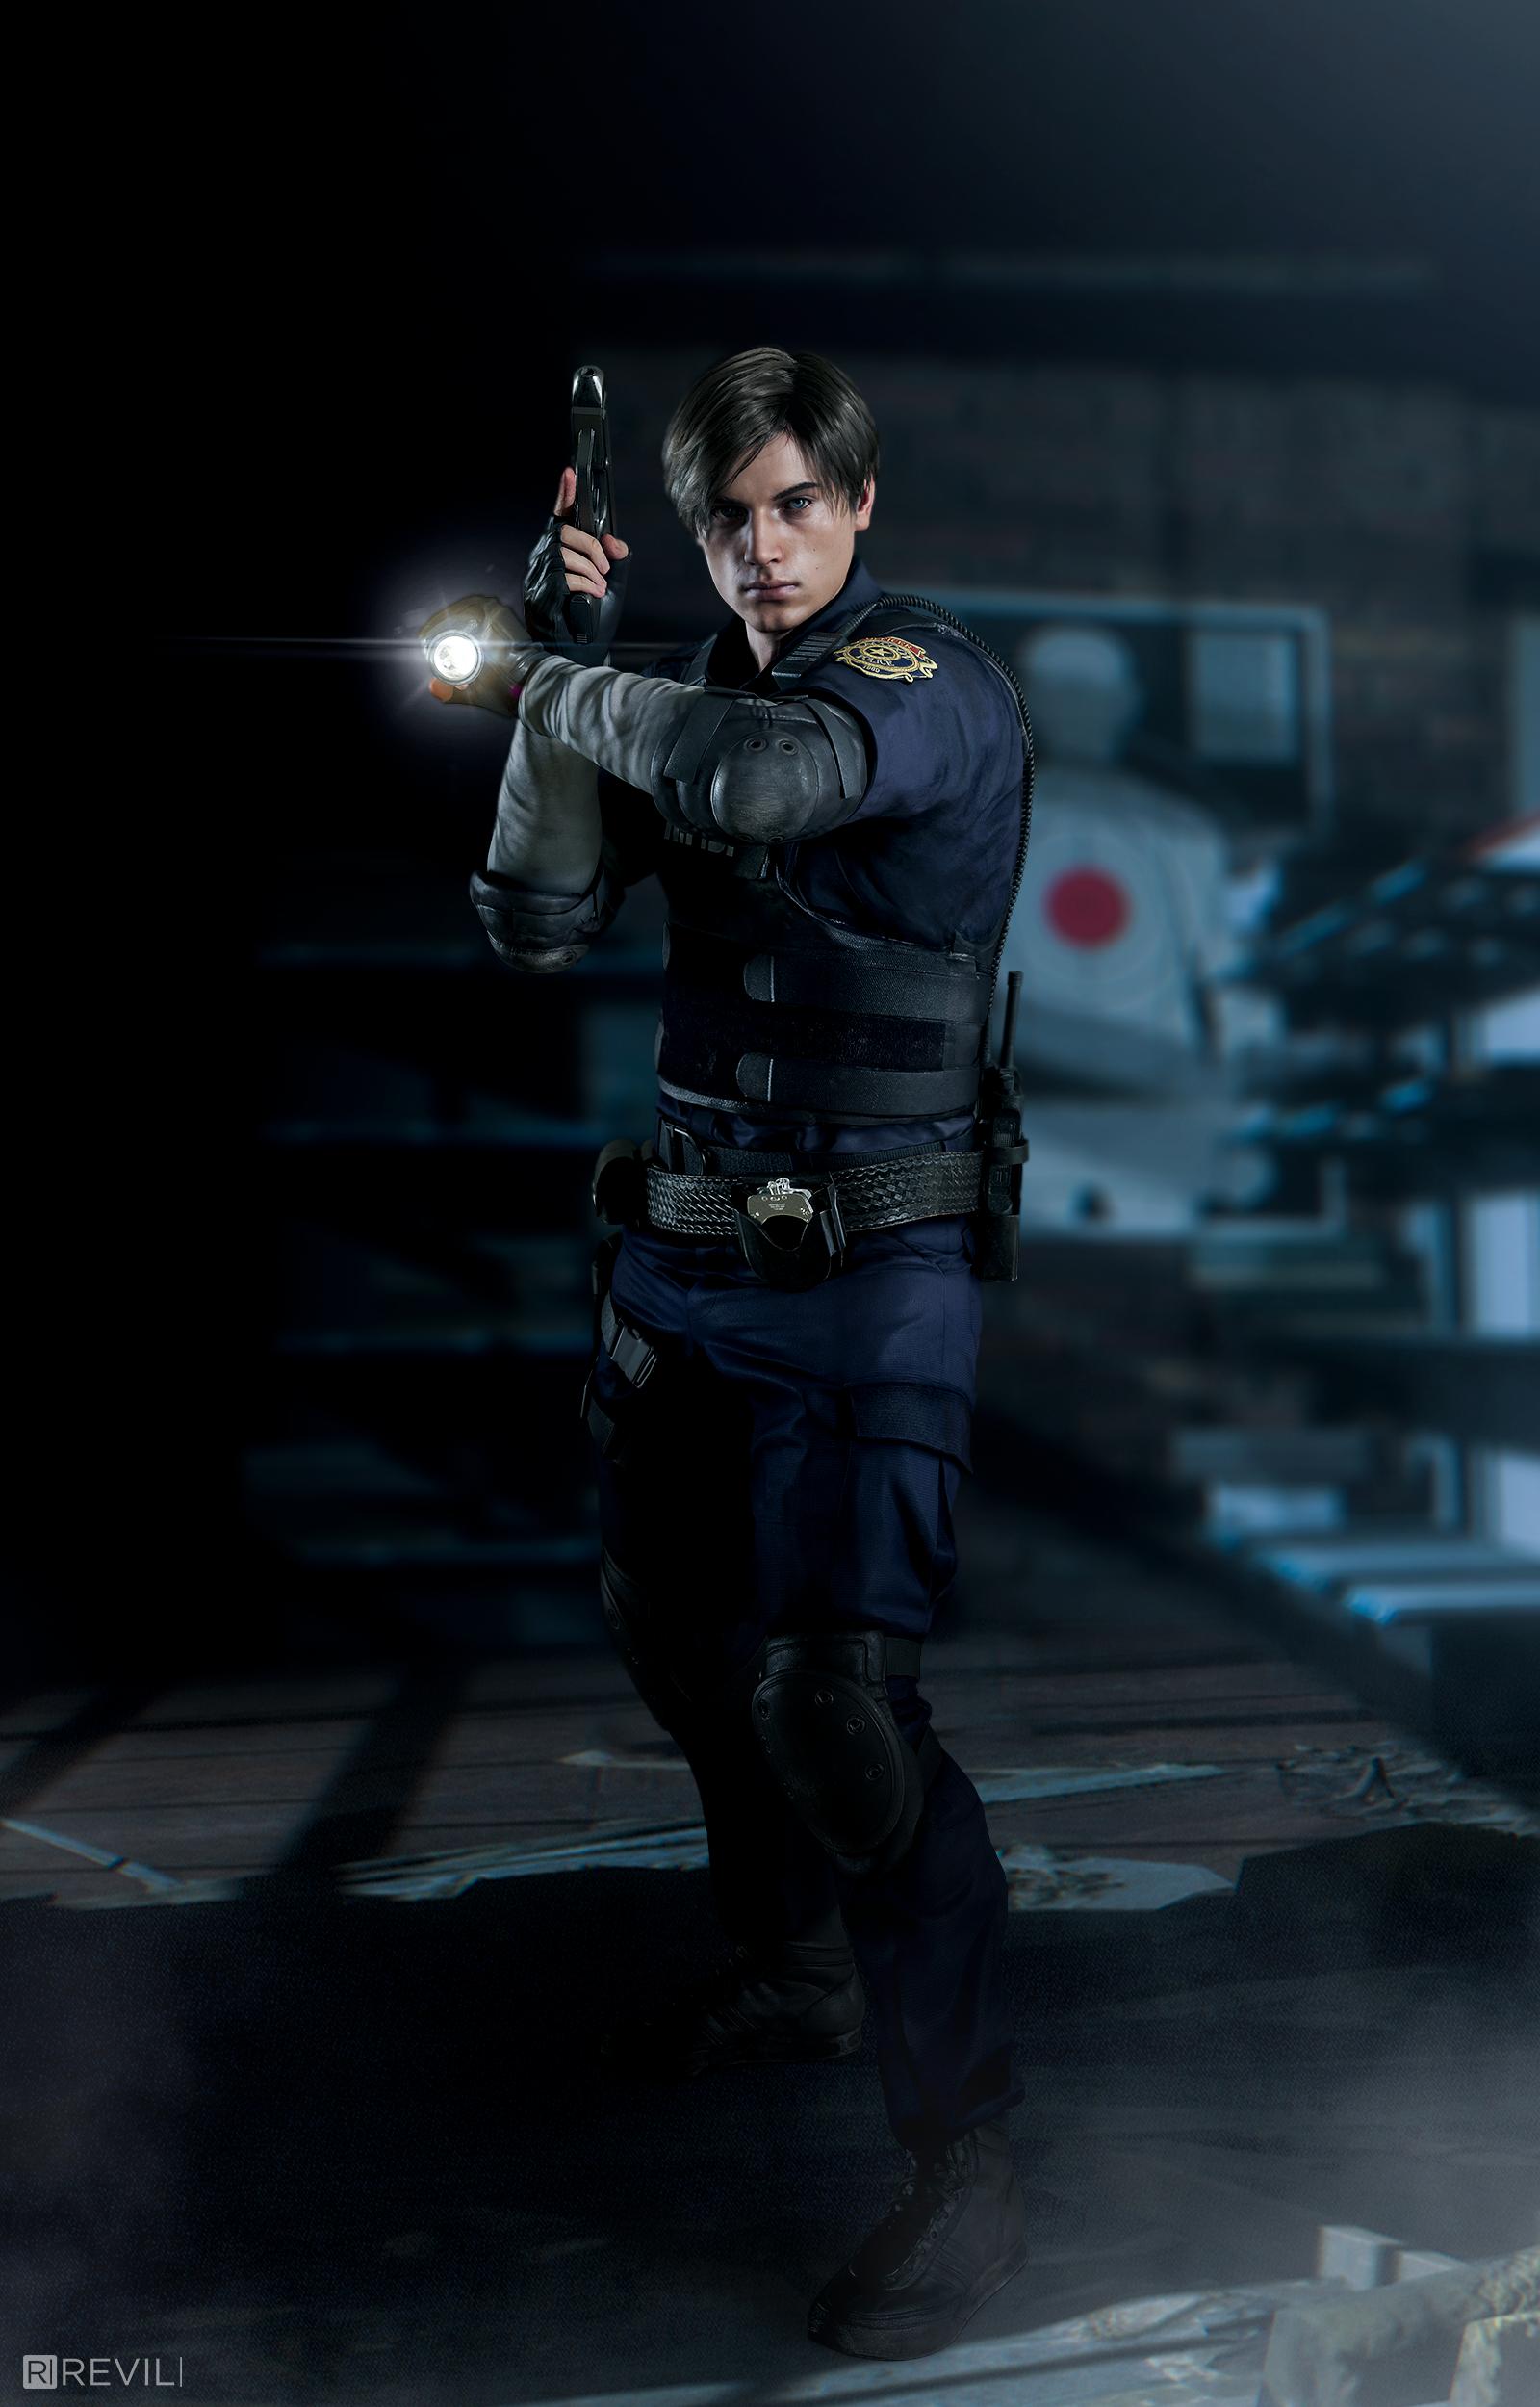 Resident Evil 2 Remake Wallpaper Posted By John Sellers